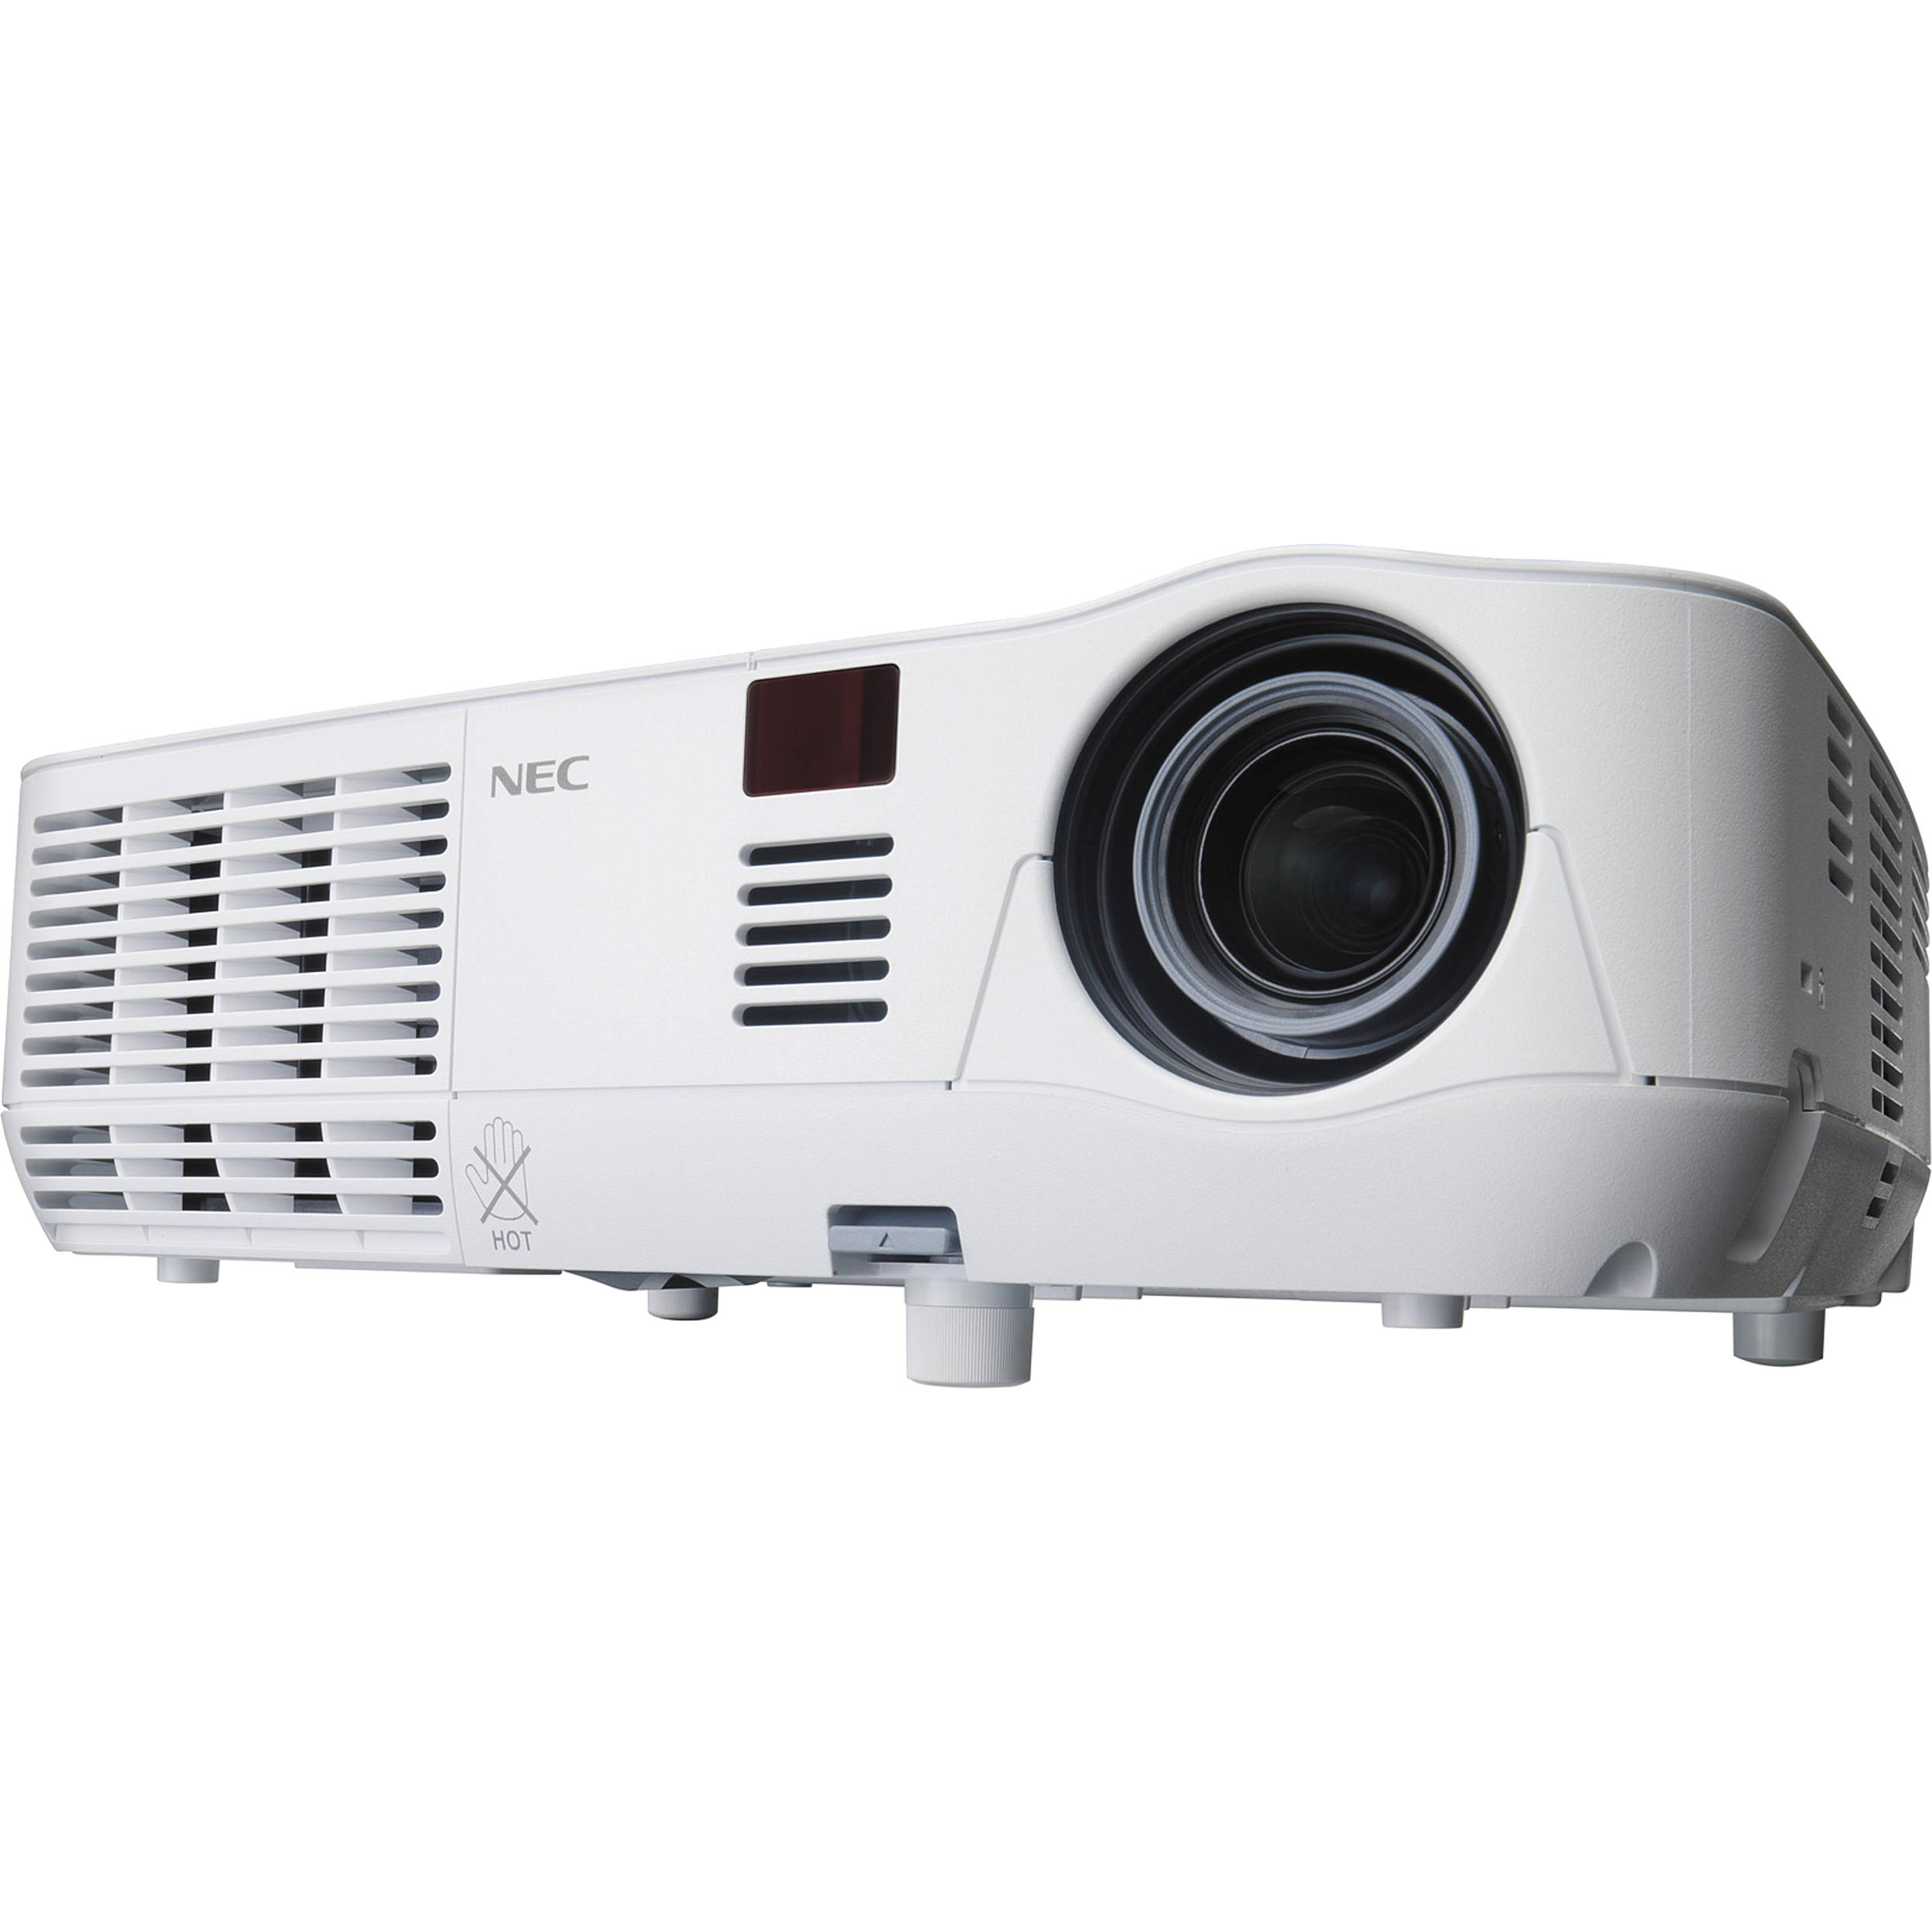 nec np v260x xga 3d mobile projector np v260x b h photo video rh bhphotovideo com NEC Dterm Series E Manual Manual III NEC Series Dterm 16305003B